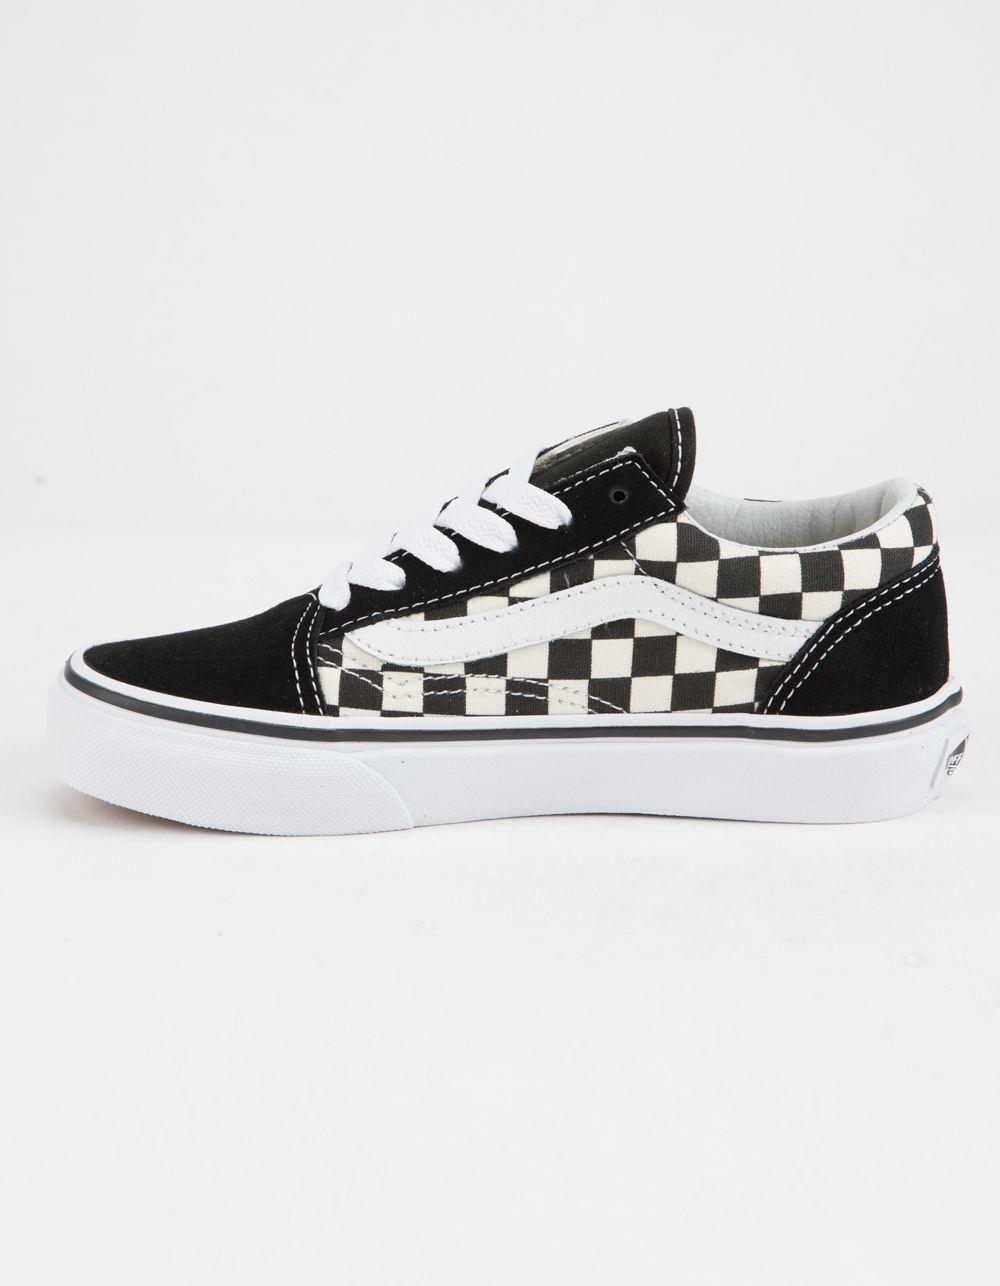 Kids shoes, Vans checkerboard